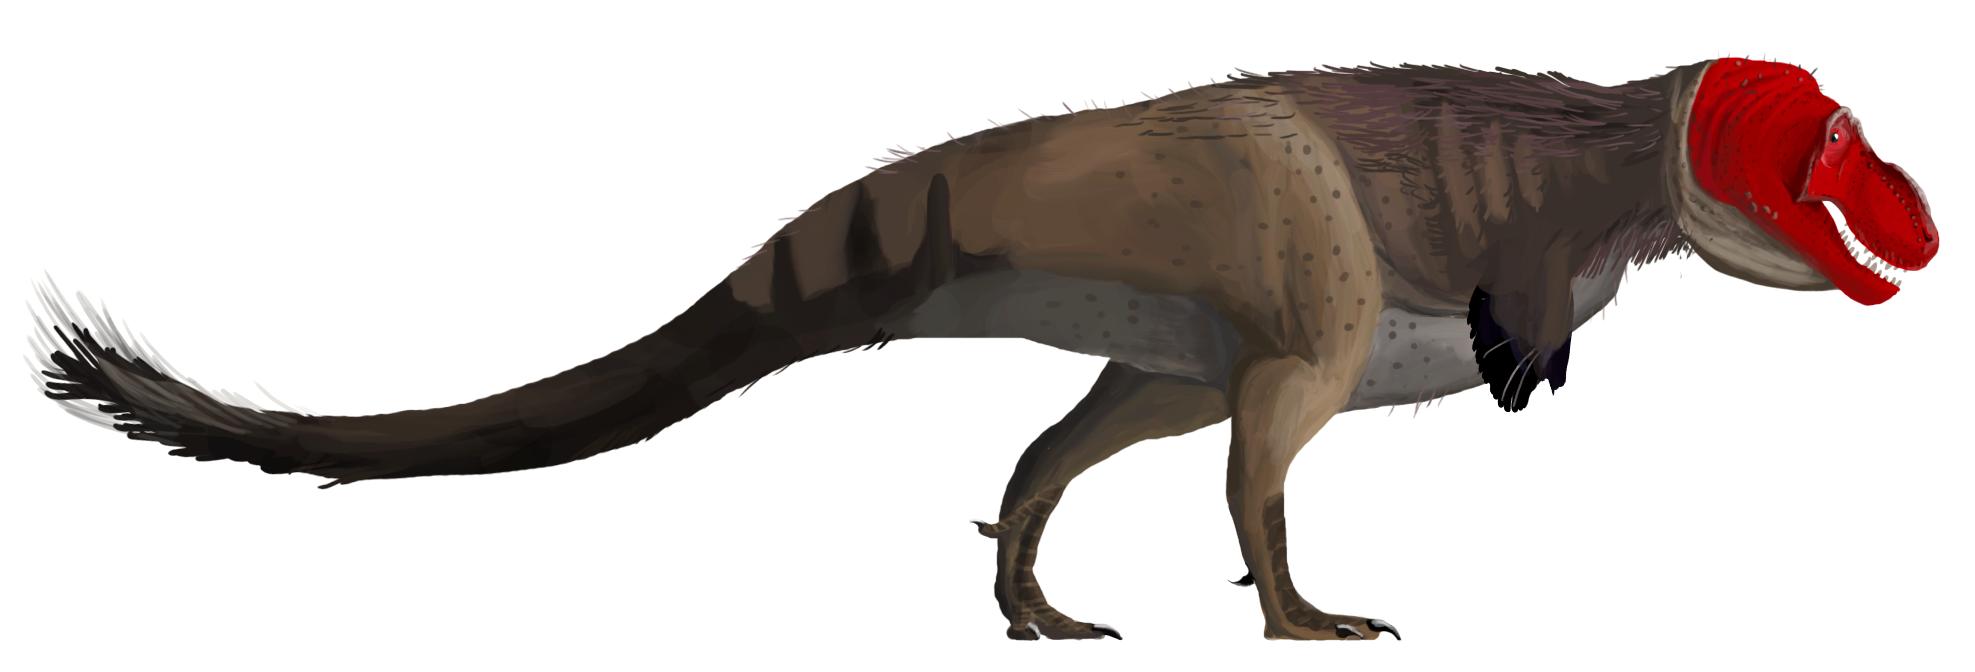 Did Jurassic Park Name t Rex